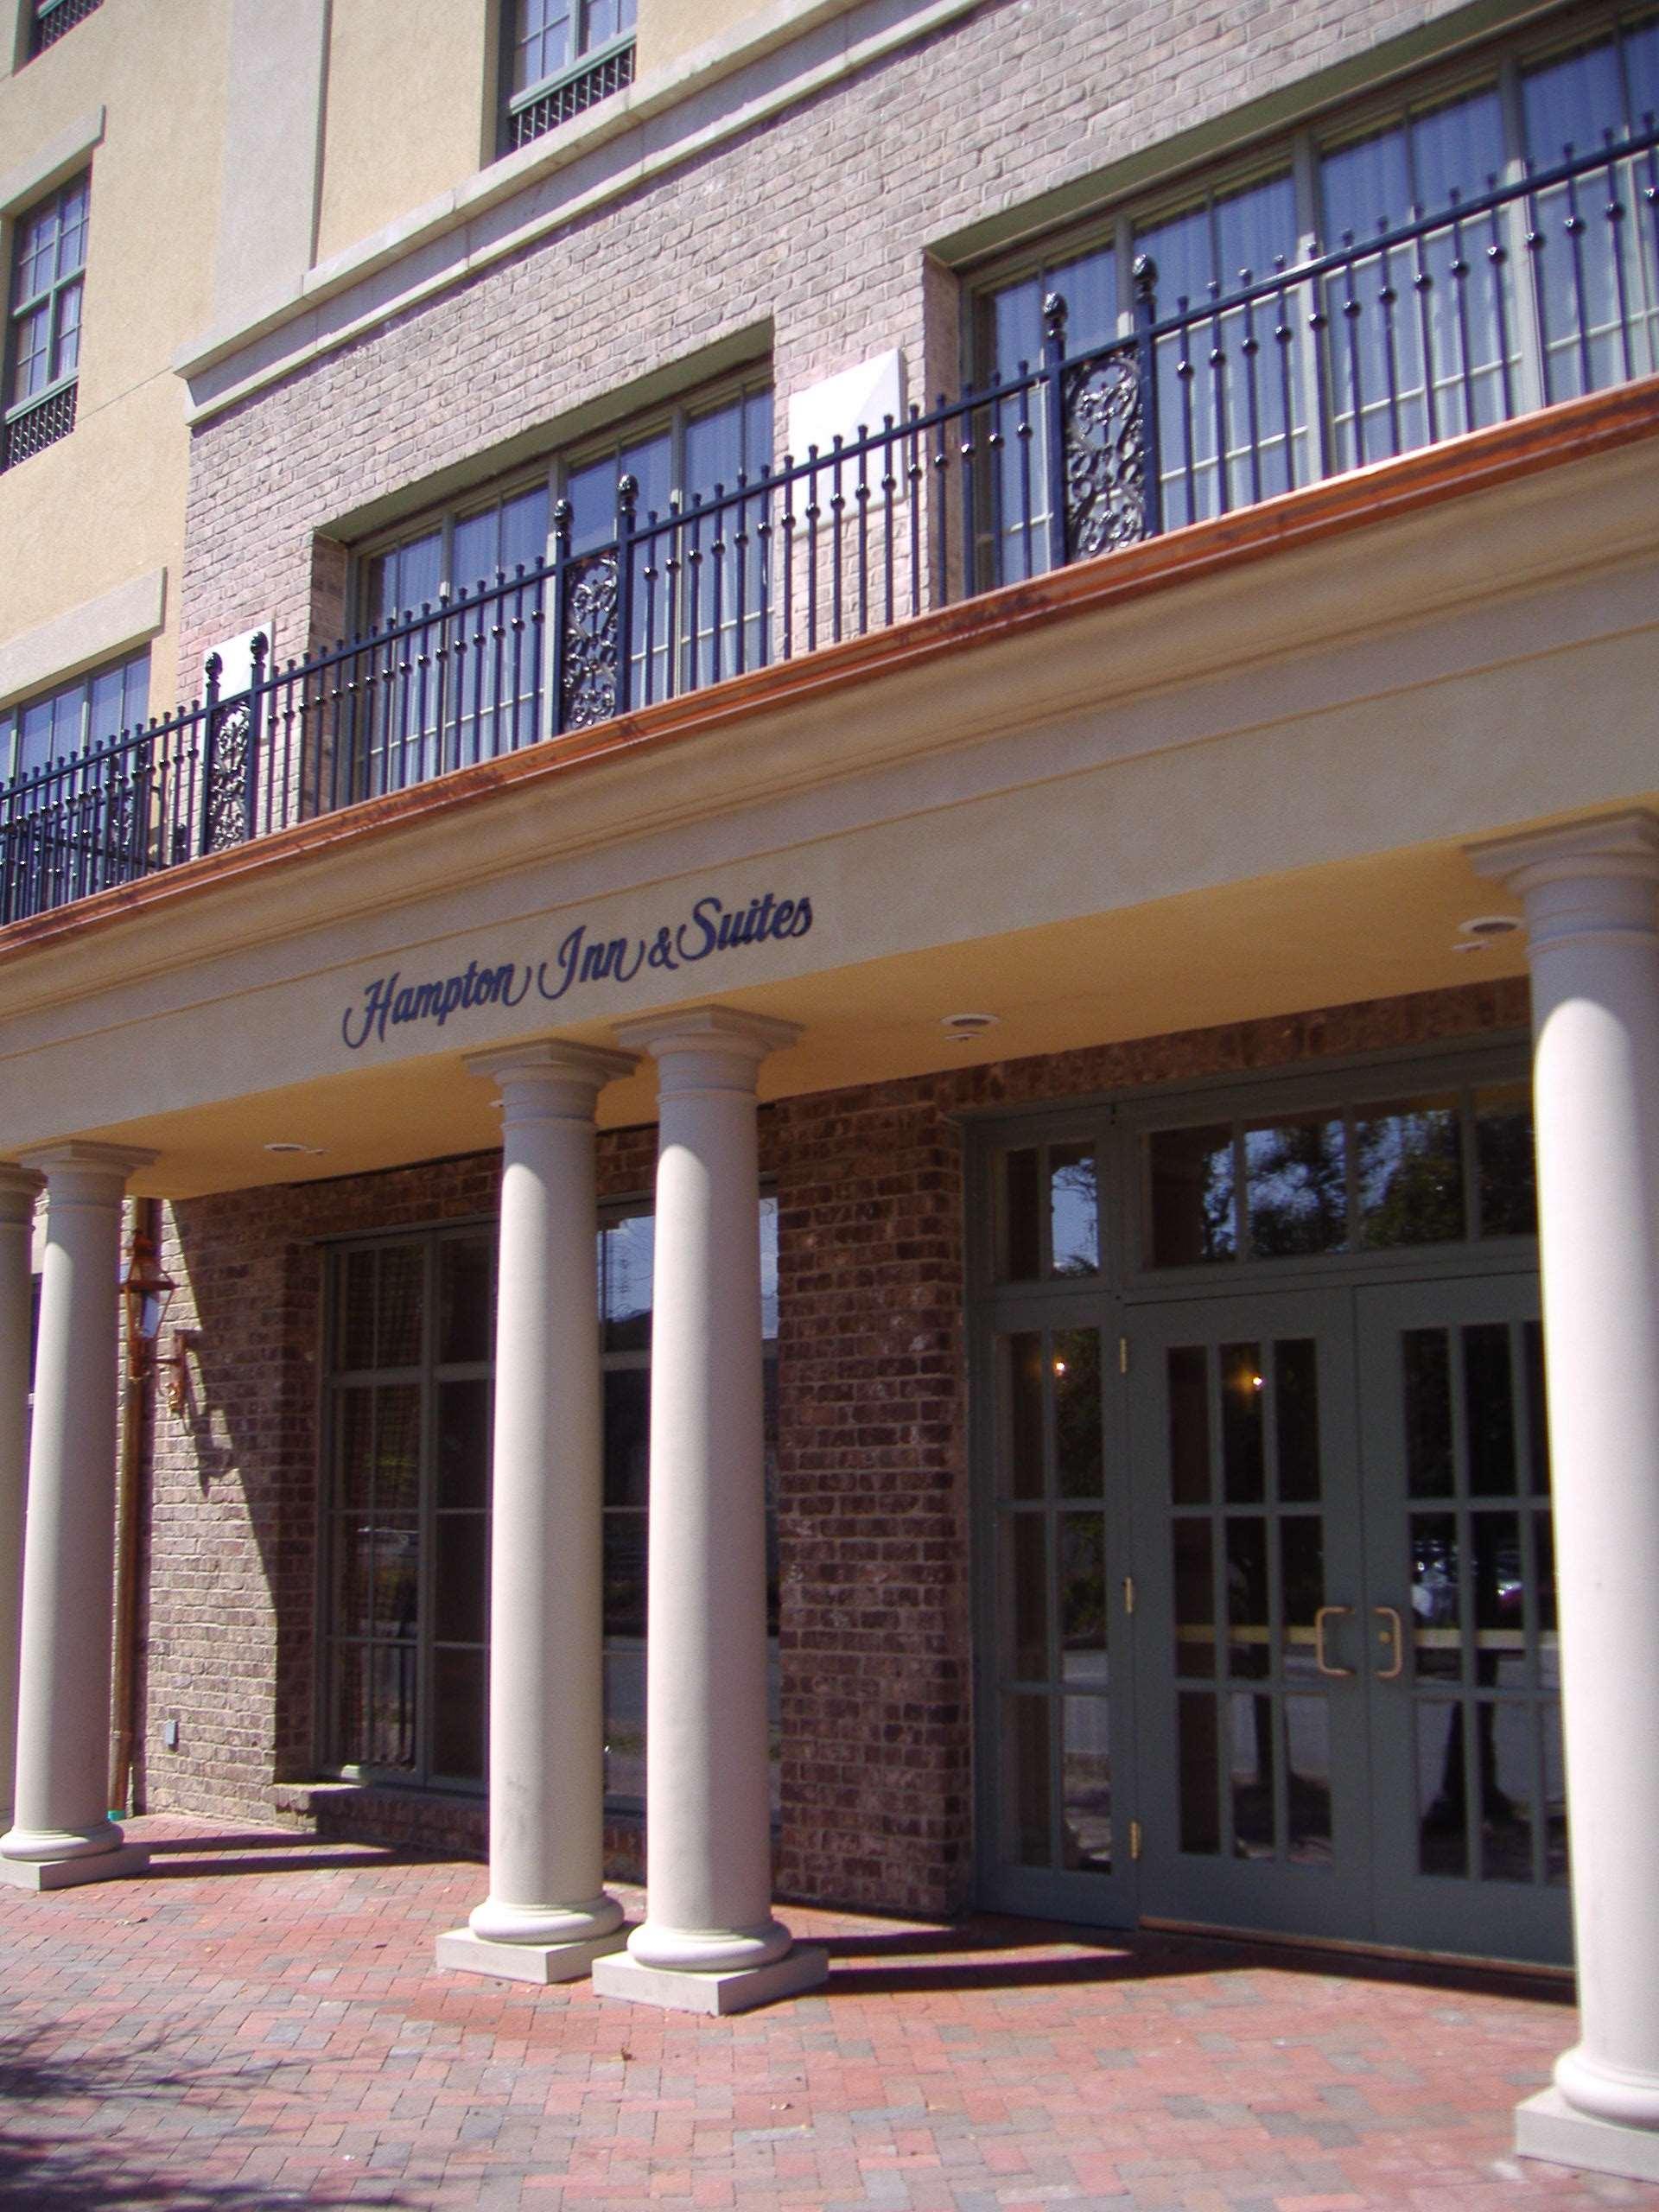 Hampton Inn & Suites Savannah Historic District image 4